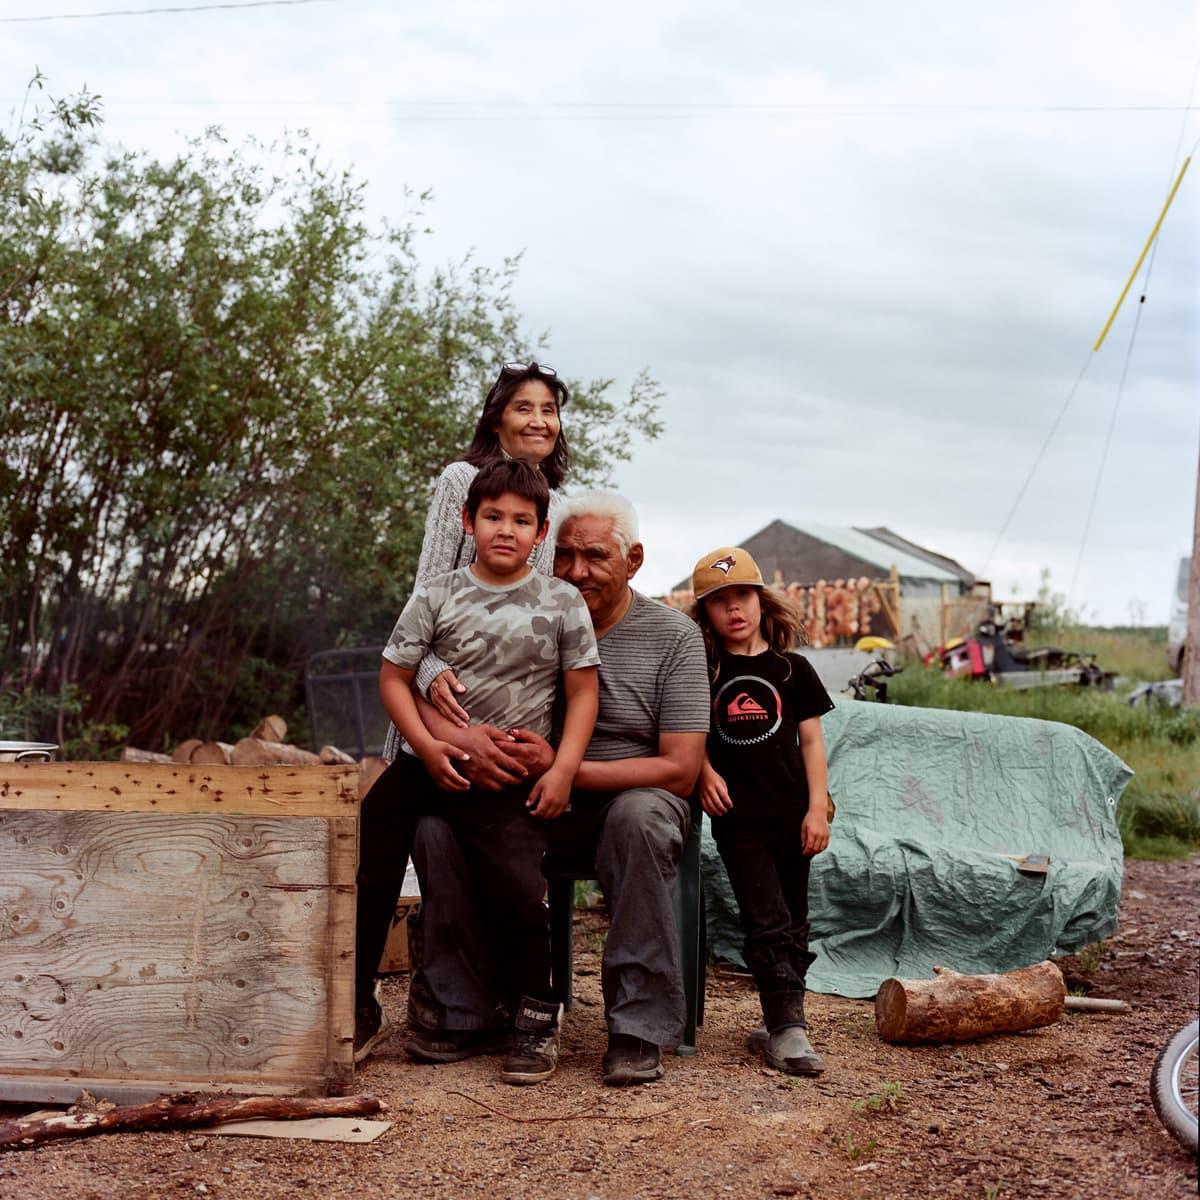 Photographing Alaska and Canada's Inuit Communities - PhotoShelter Blog